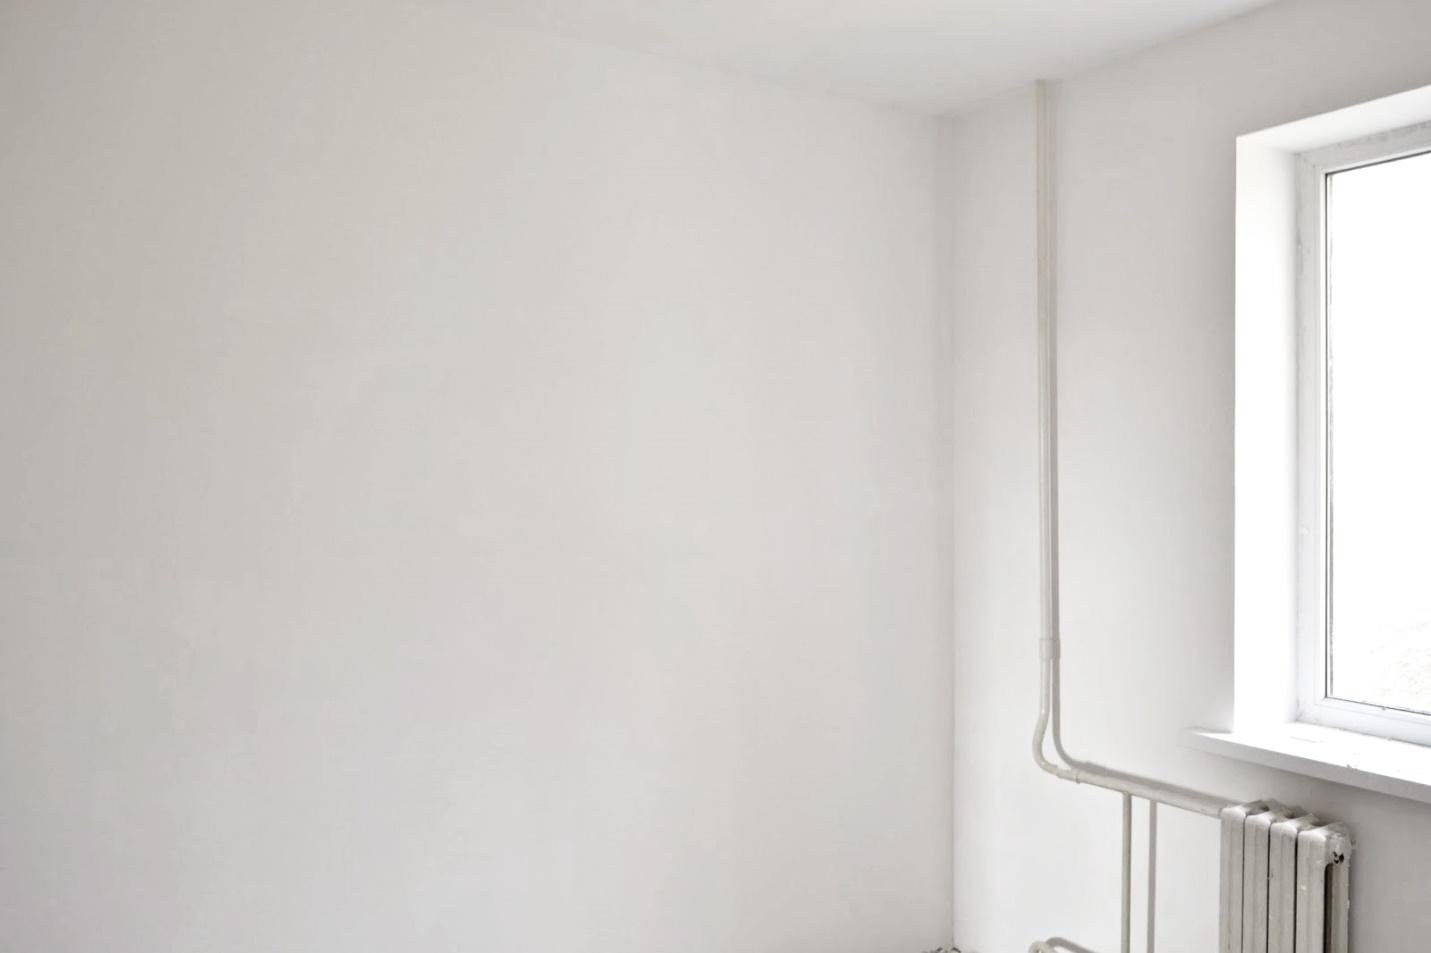 Фото ровных стен